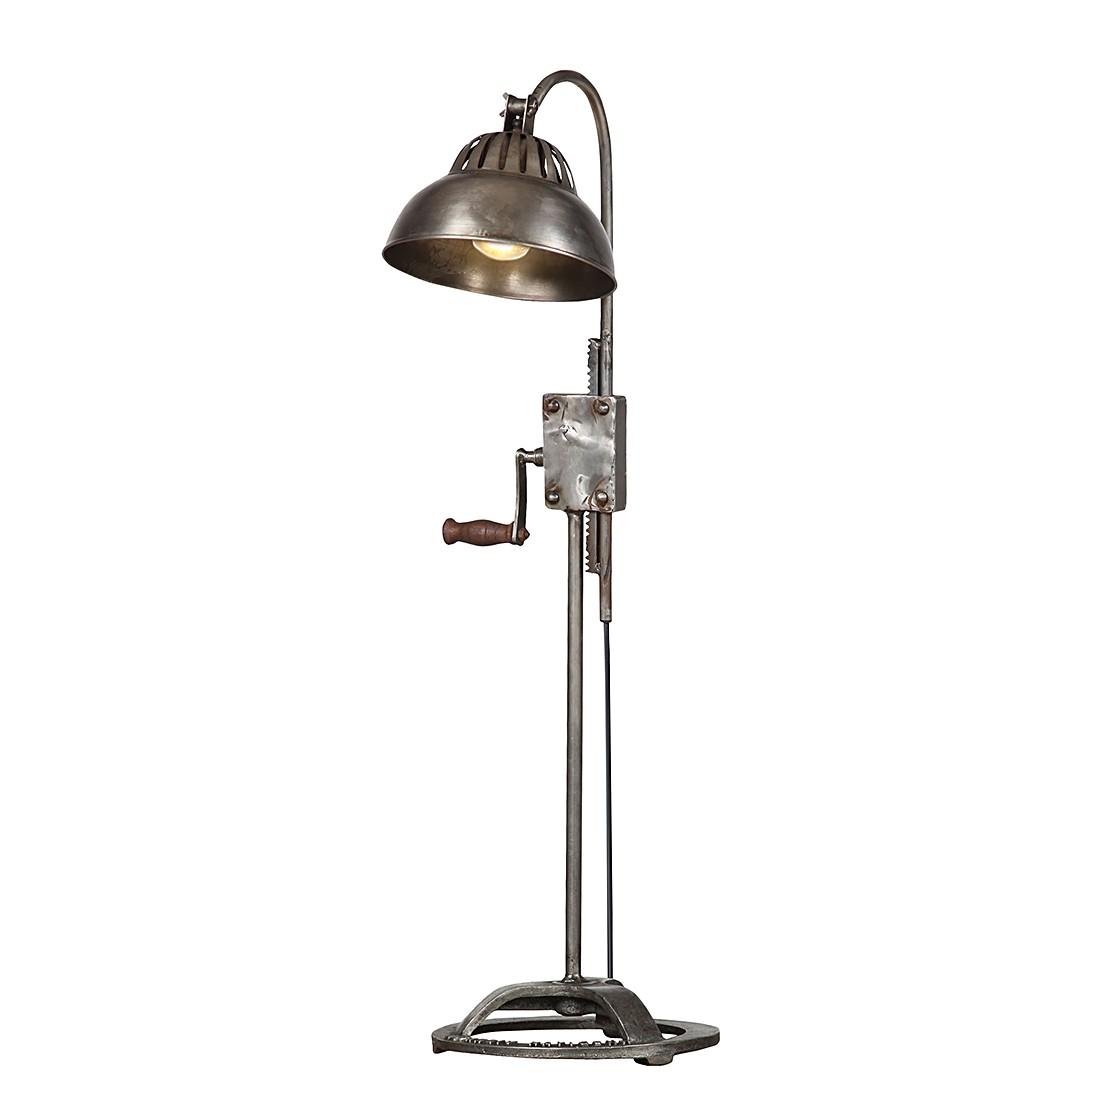 Tischlampe  Vanha II - Eisen - vernickelt - 1-flamming, furnlab